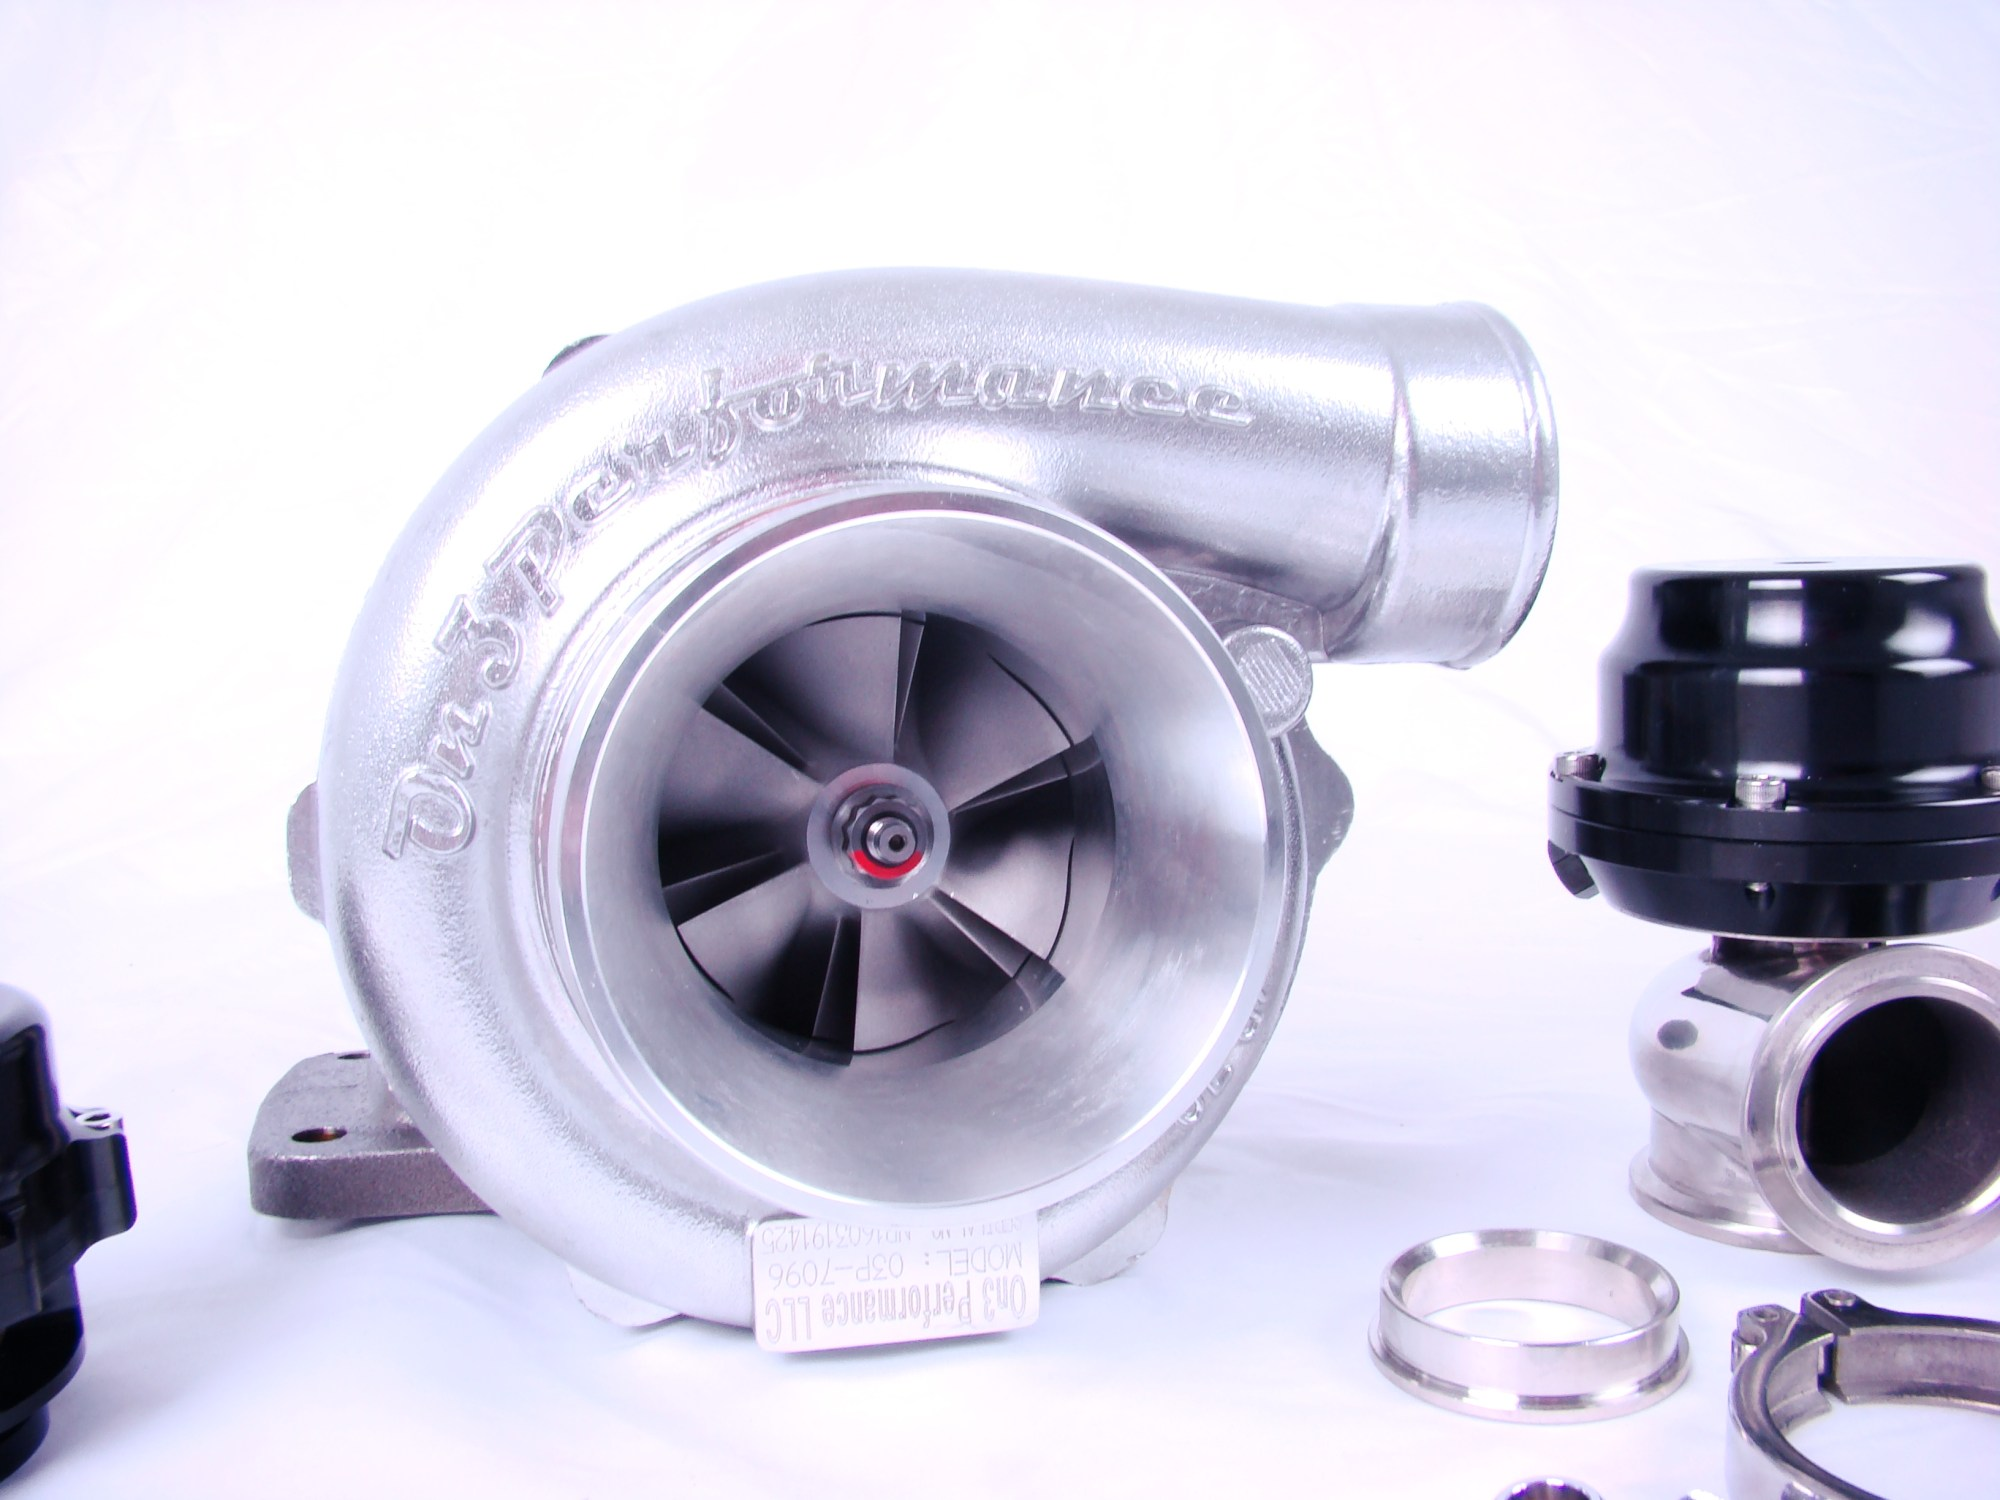 hight resolution of 1987 93 mustang gt cobra 5 0 foxbody single turbo system